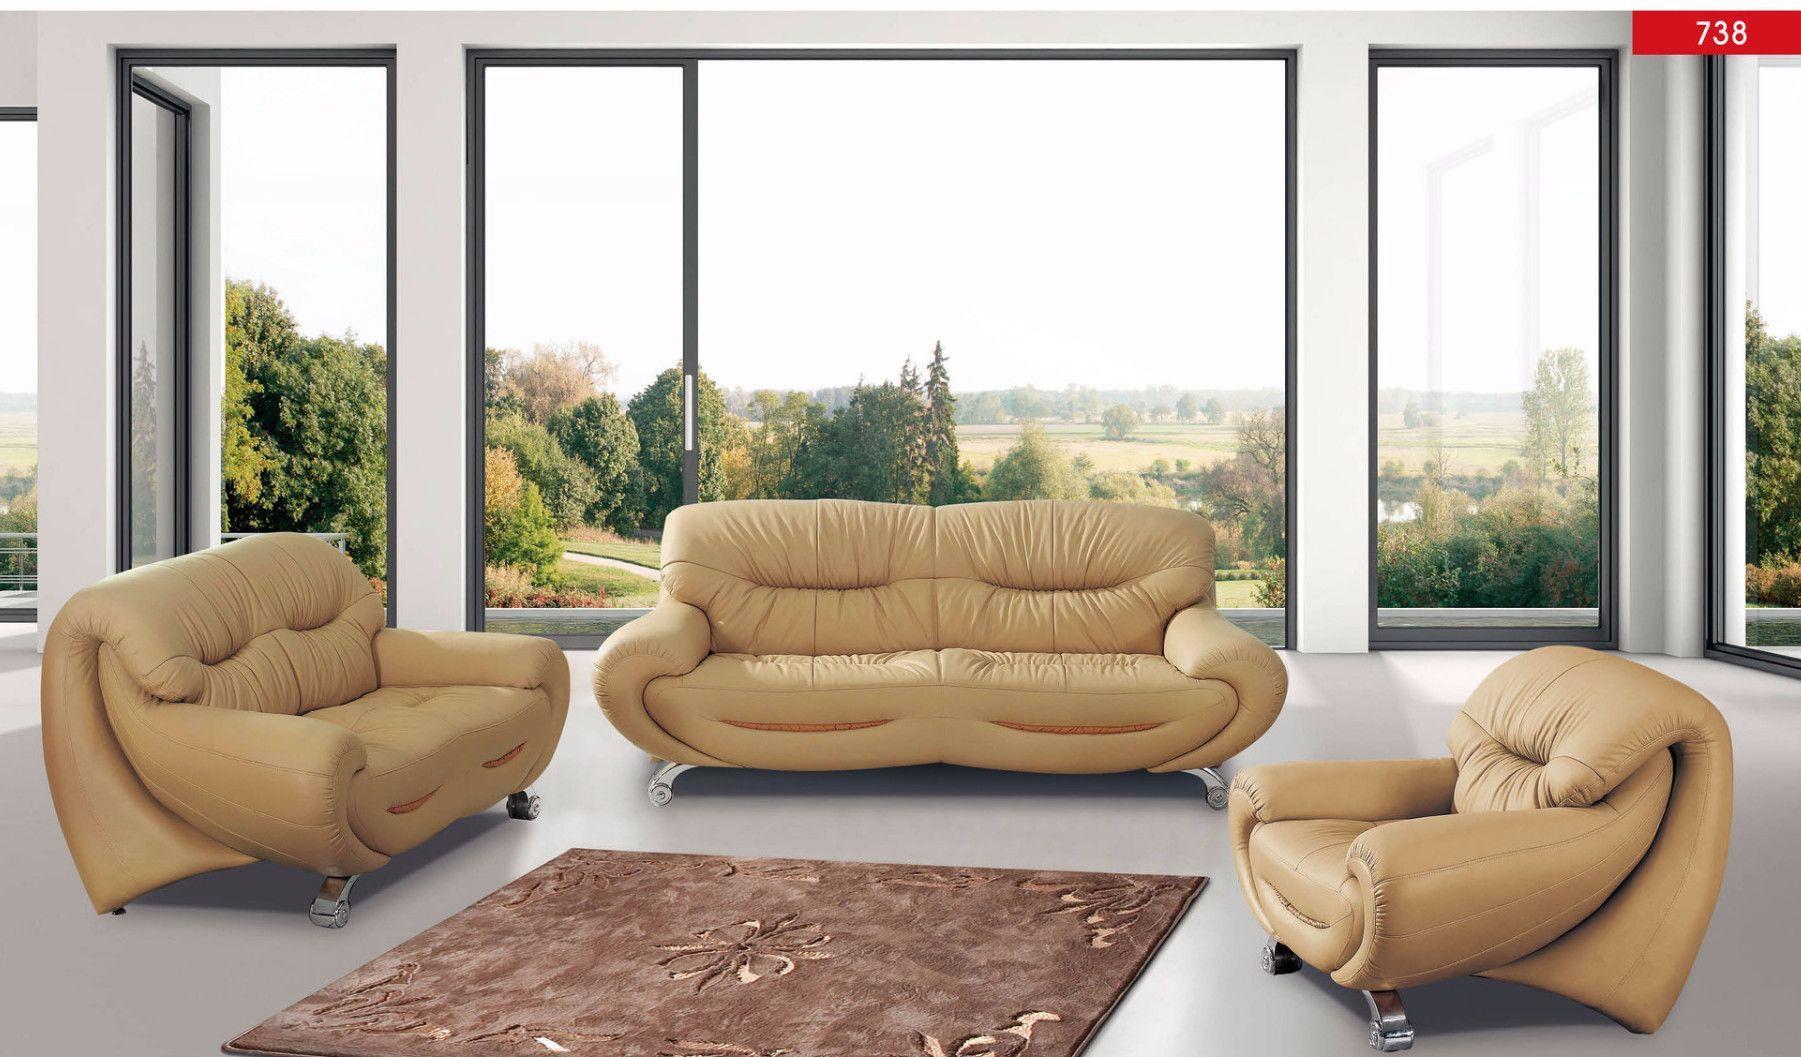 Luca Home Sofa, Loveseat, Chair Set